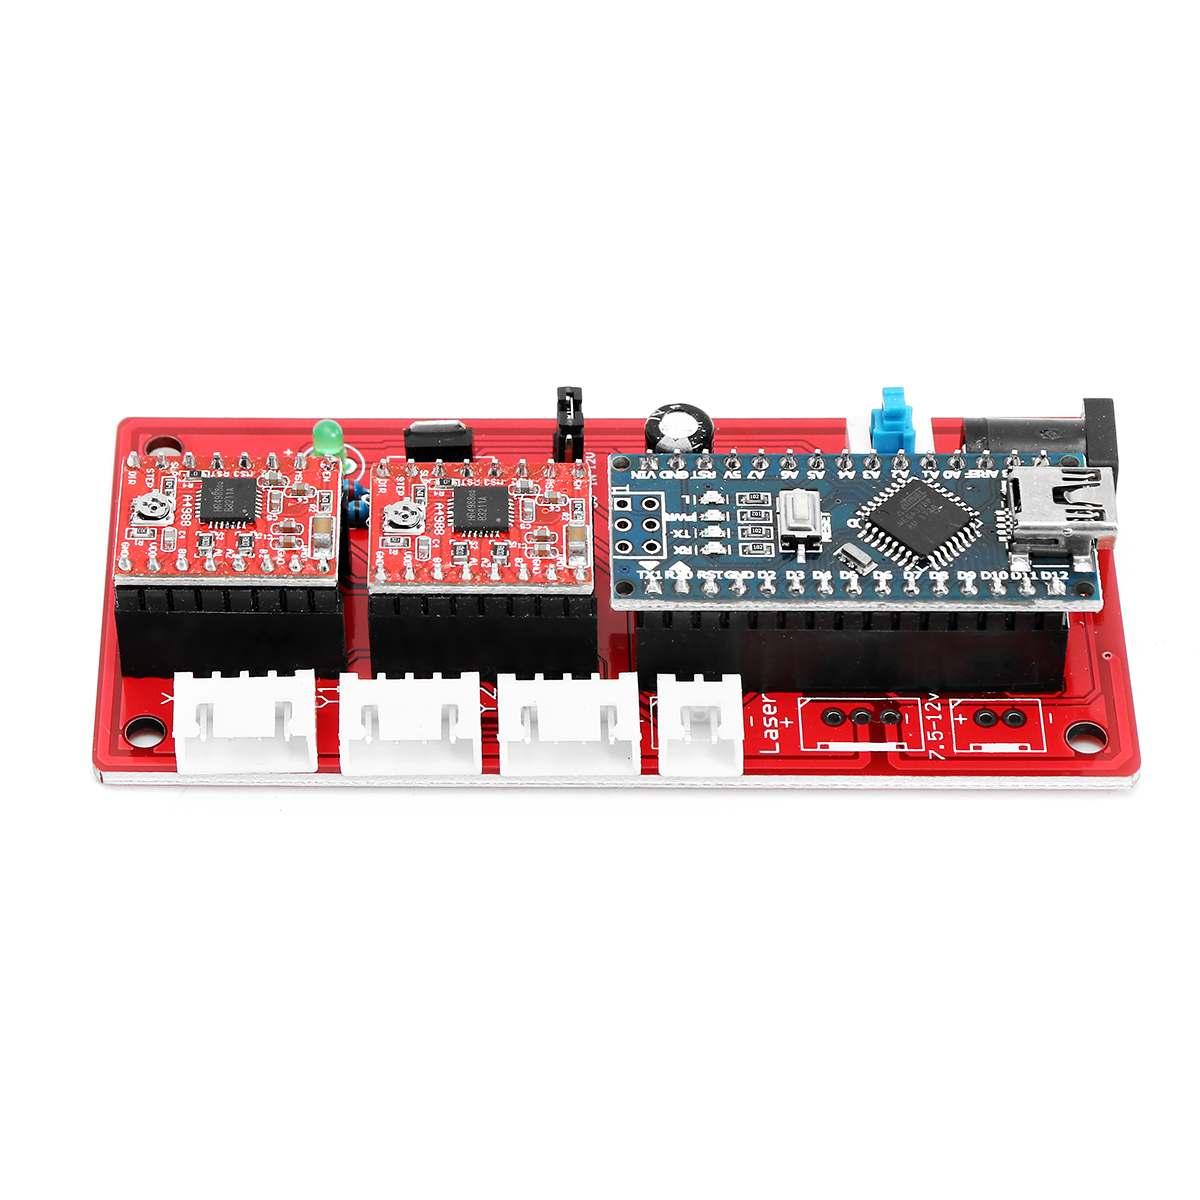 USB 2 Axis Control Board Laser Driver DIY Laser Engraving Machine font b Motherboard b font